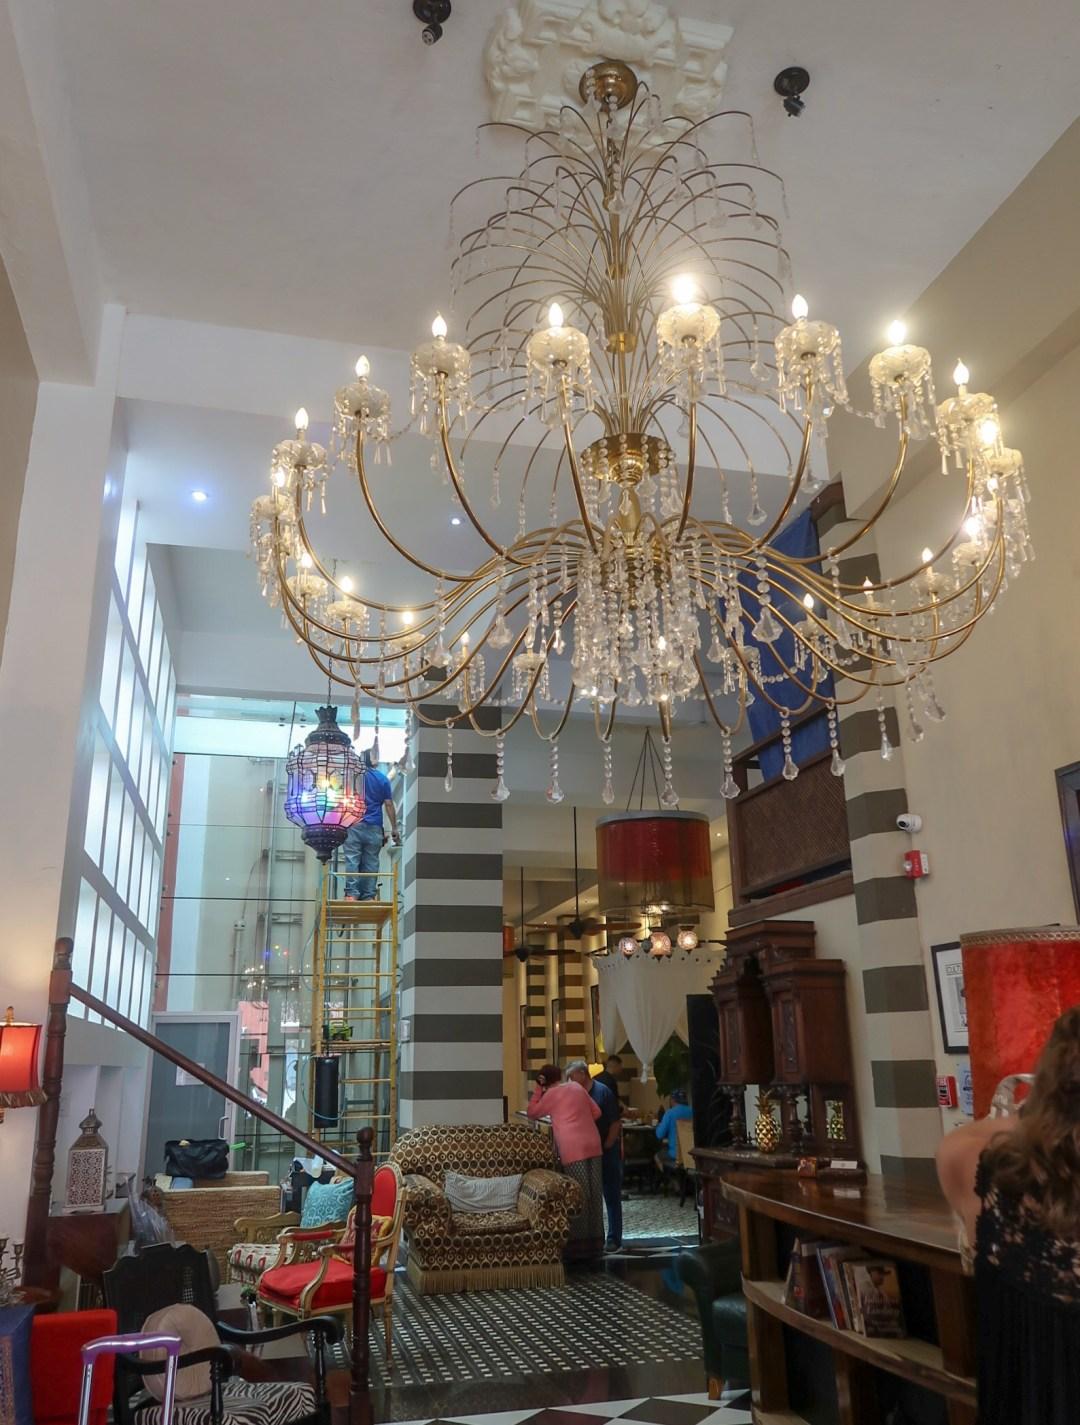 casablanca hotel, old san juan